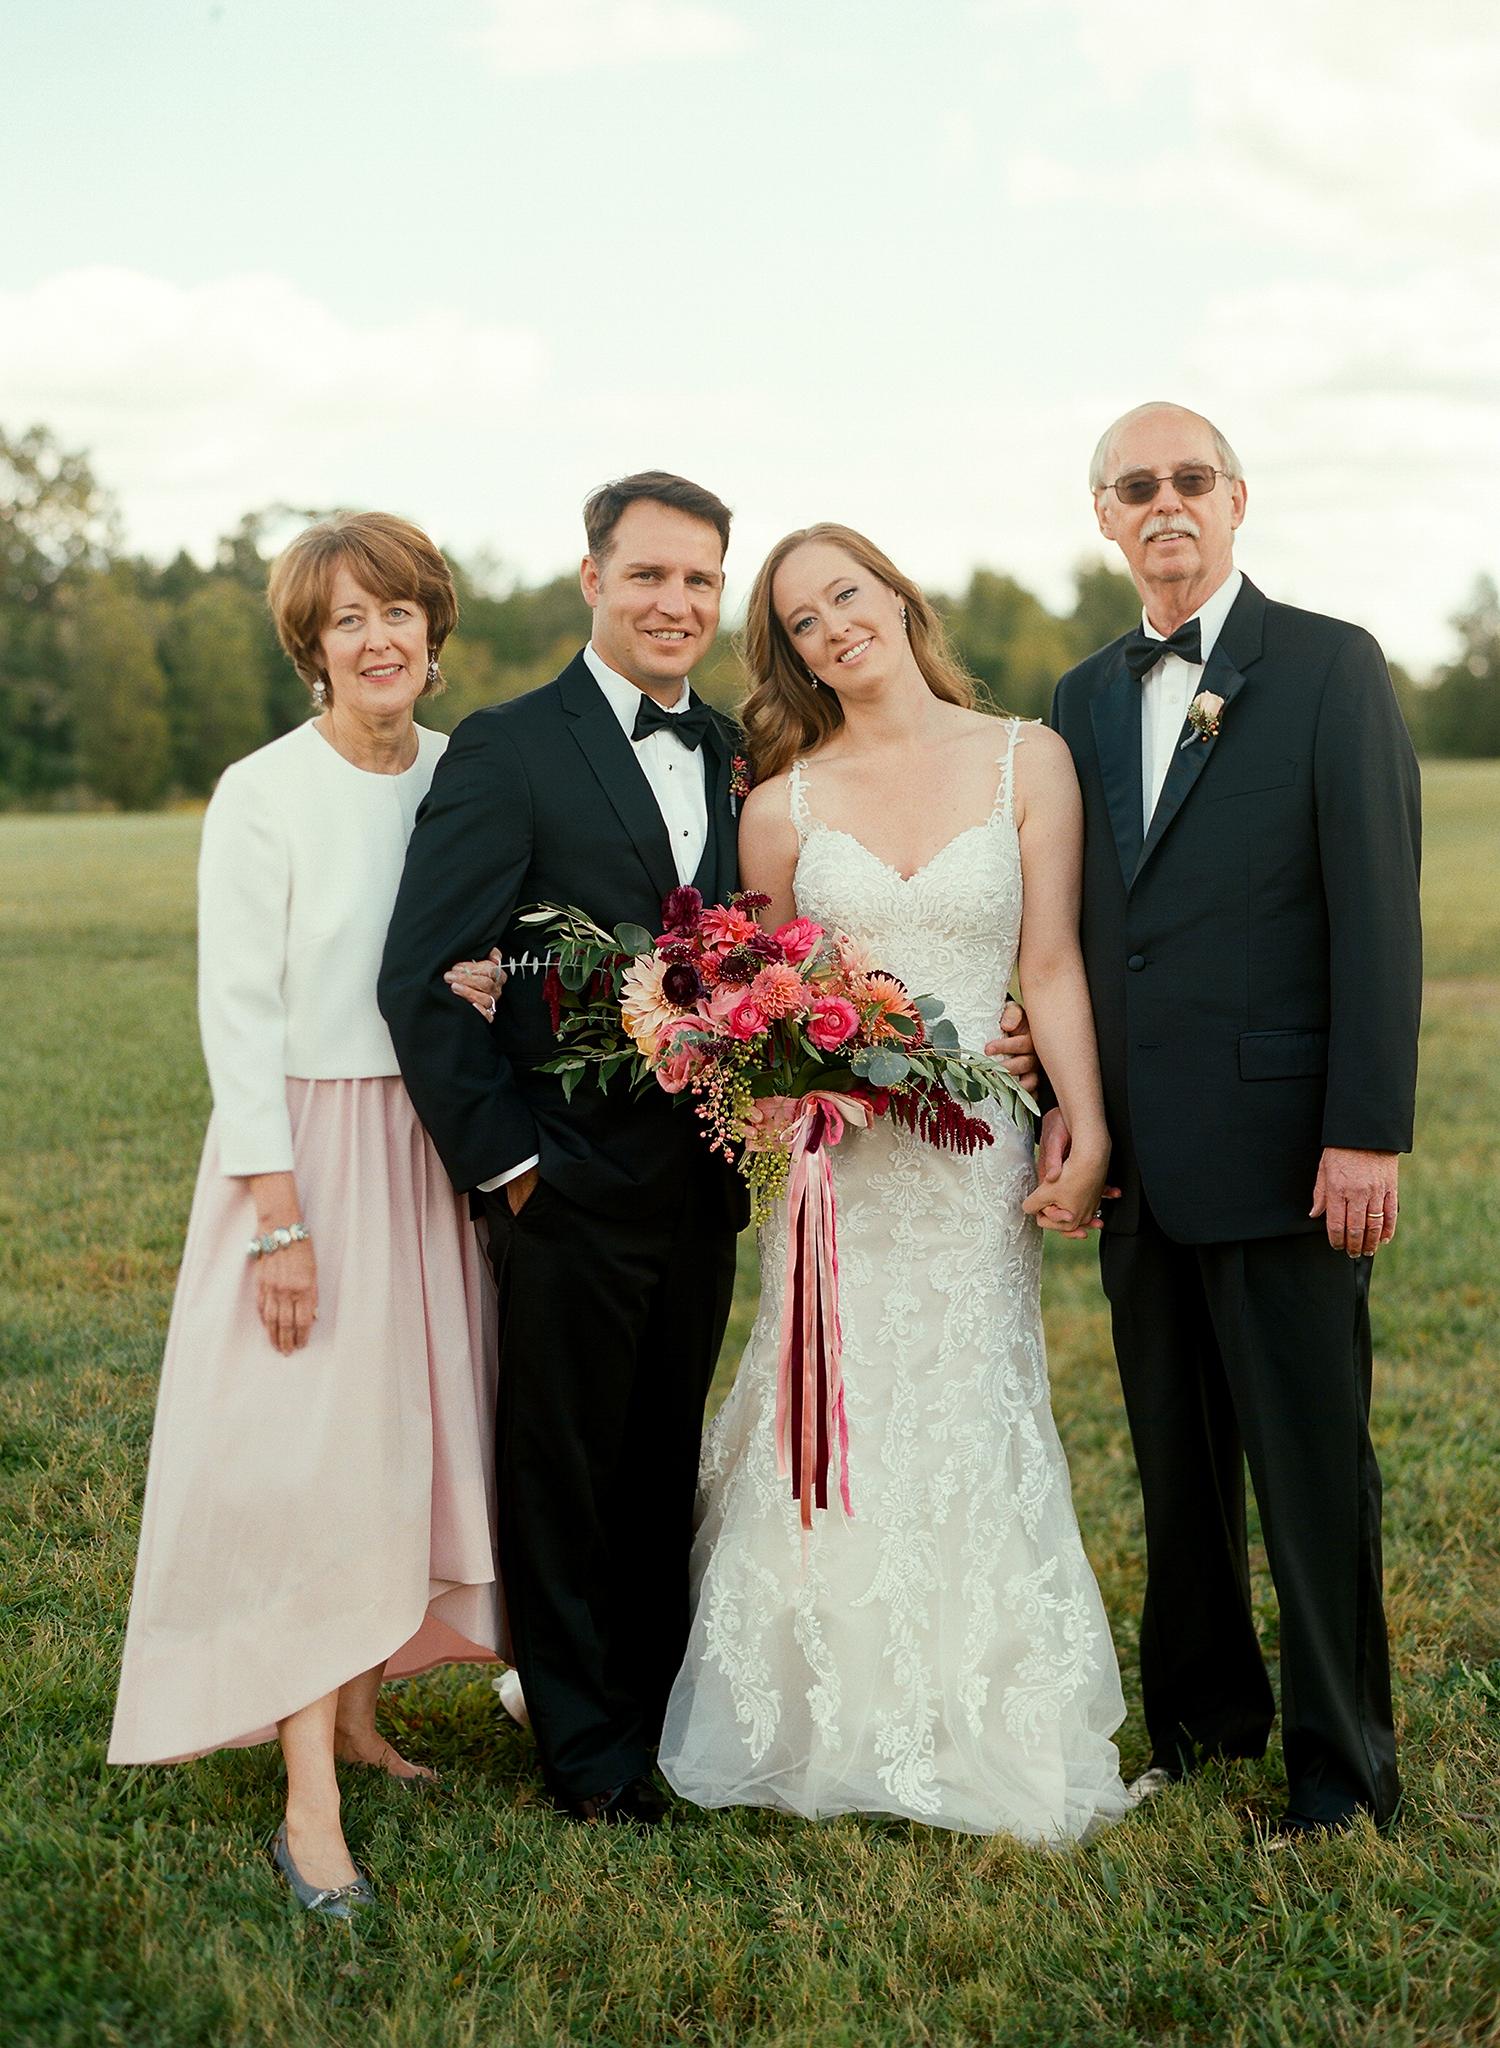 jen geoff wedding couple with parents